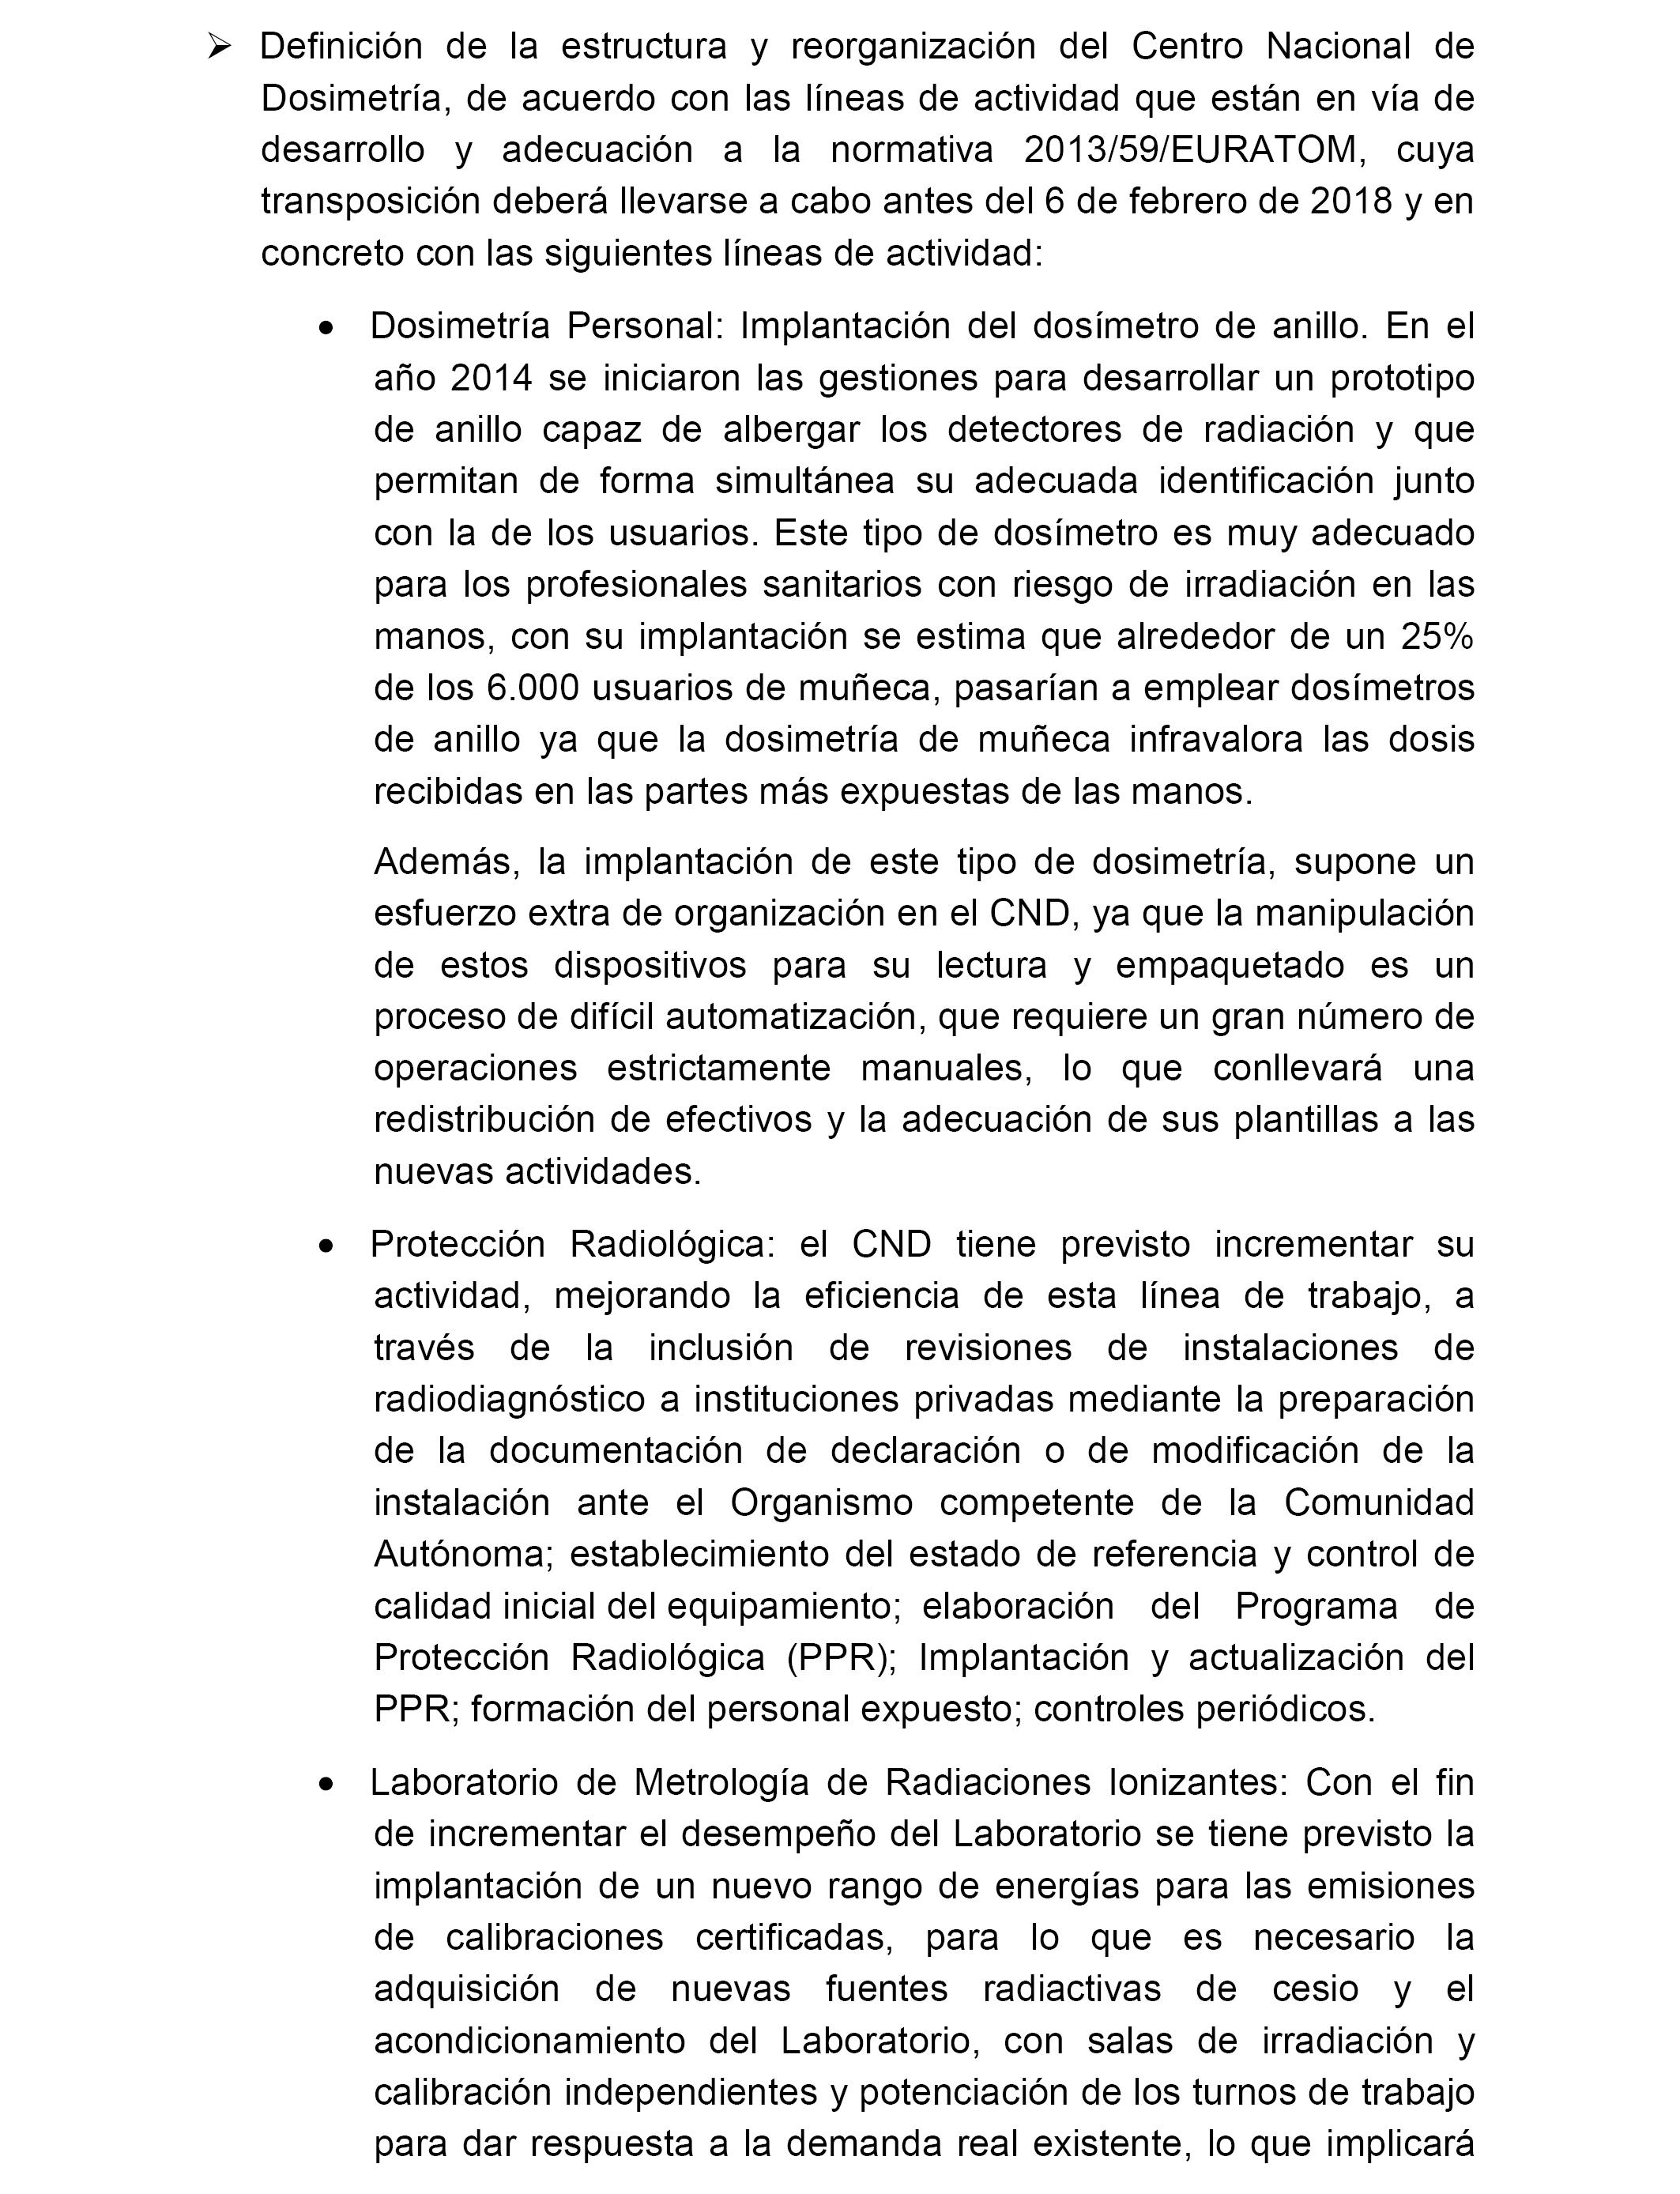 BOE.es - Documento BOE-A-2018-1266